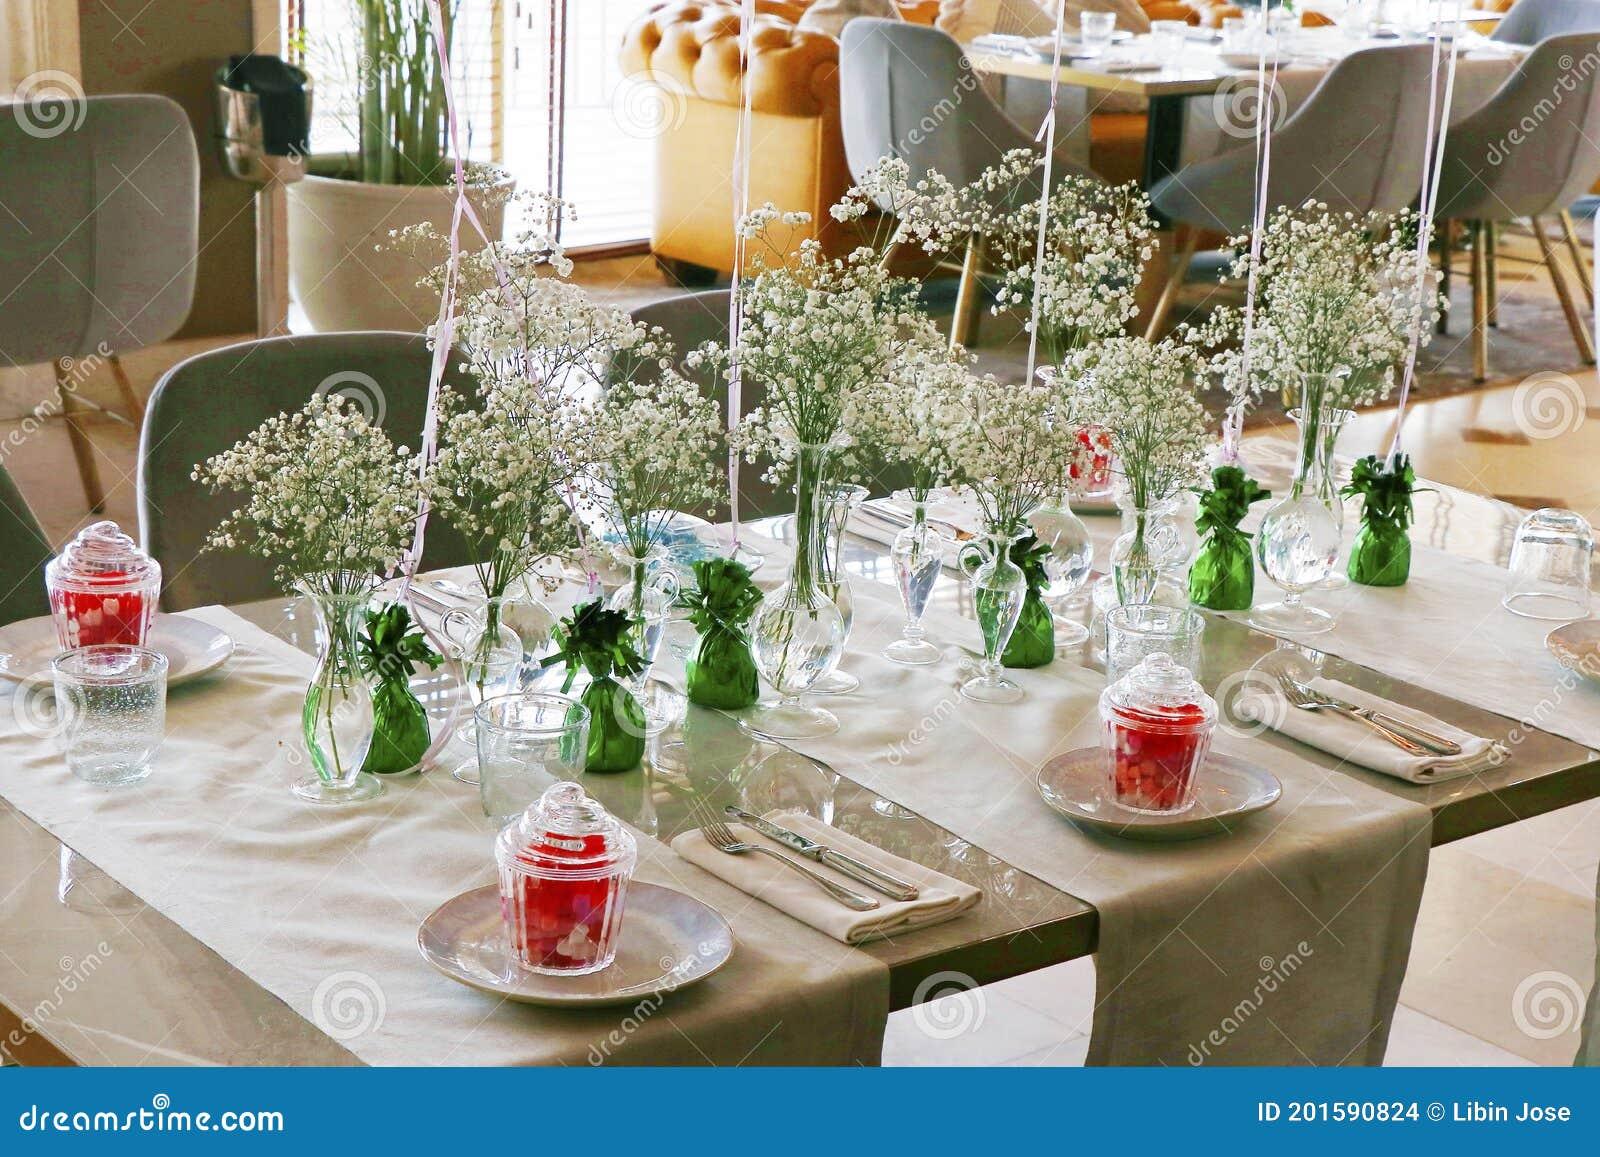 Modern Birthday Decoration With Luxury Dining Table Set Up Stock Photo Image Of Decor Blue 201590824